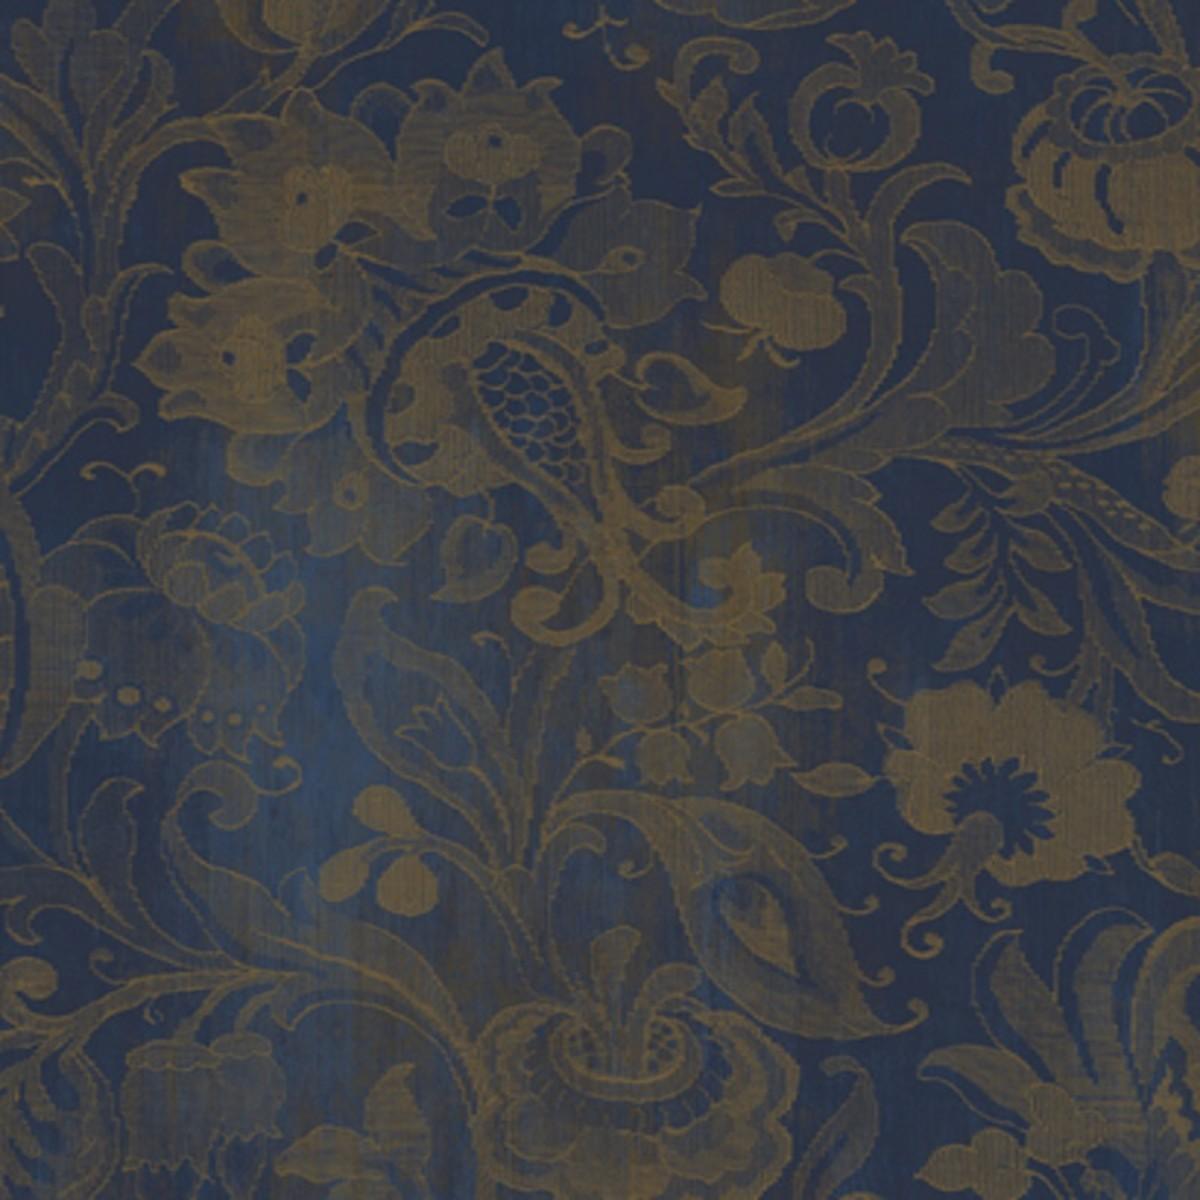 Виниловые обои York Wallcoverings синие TH6332 0.68 м